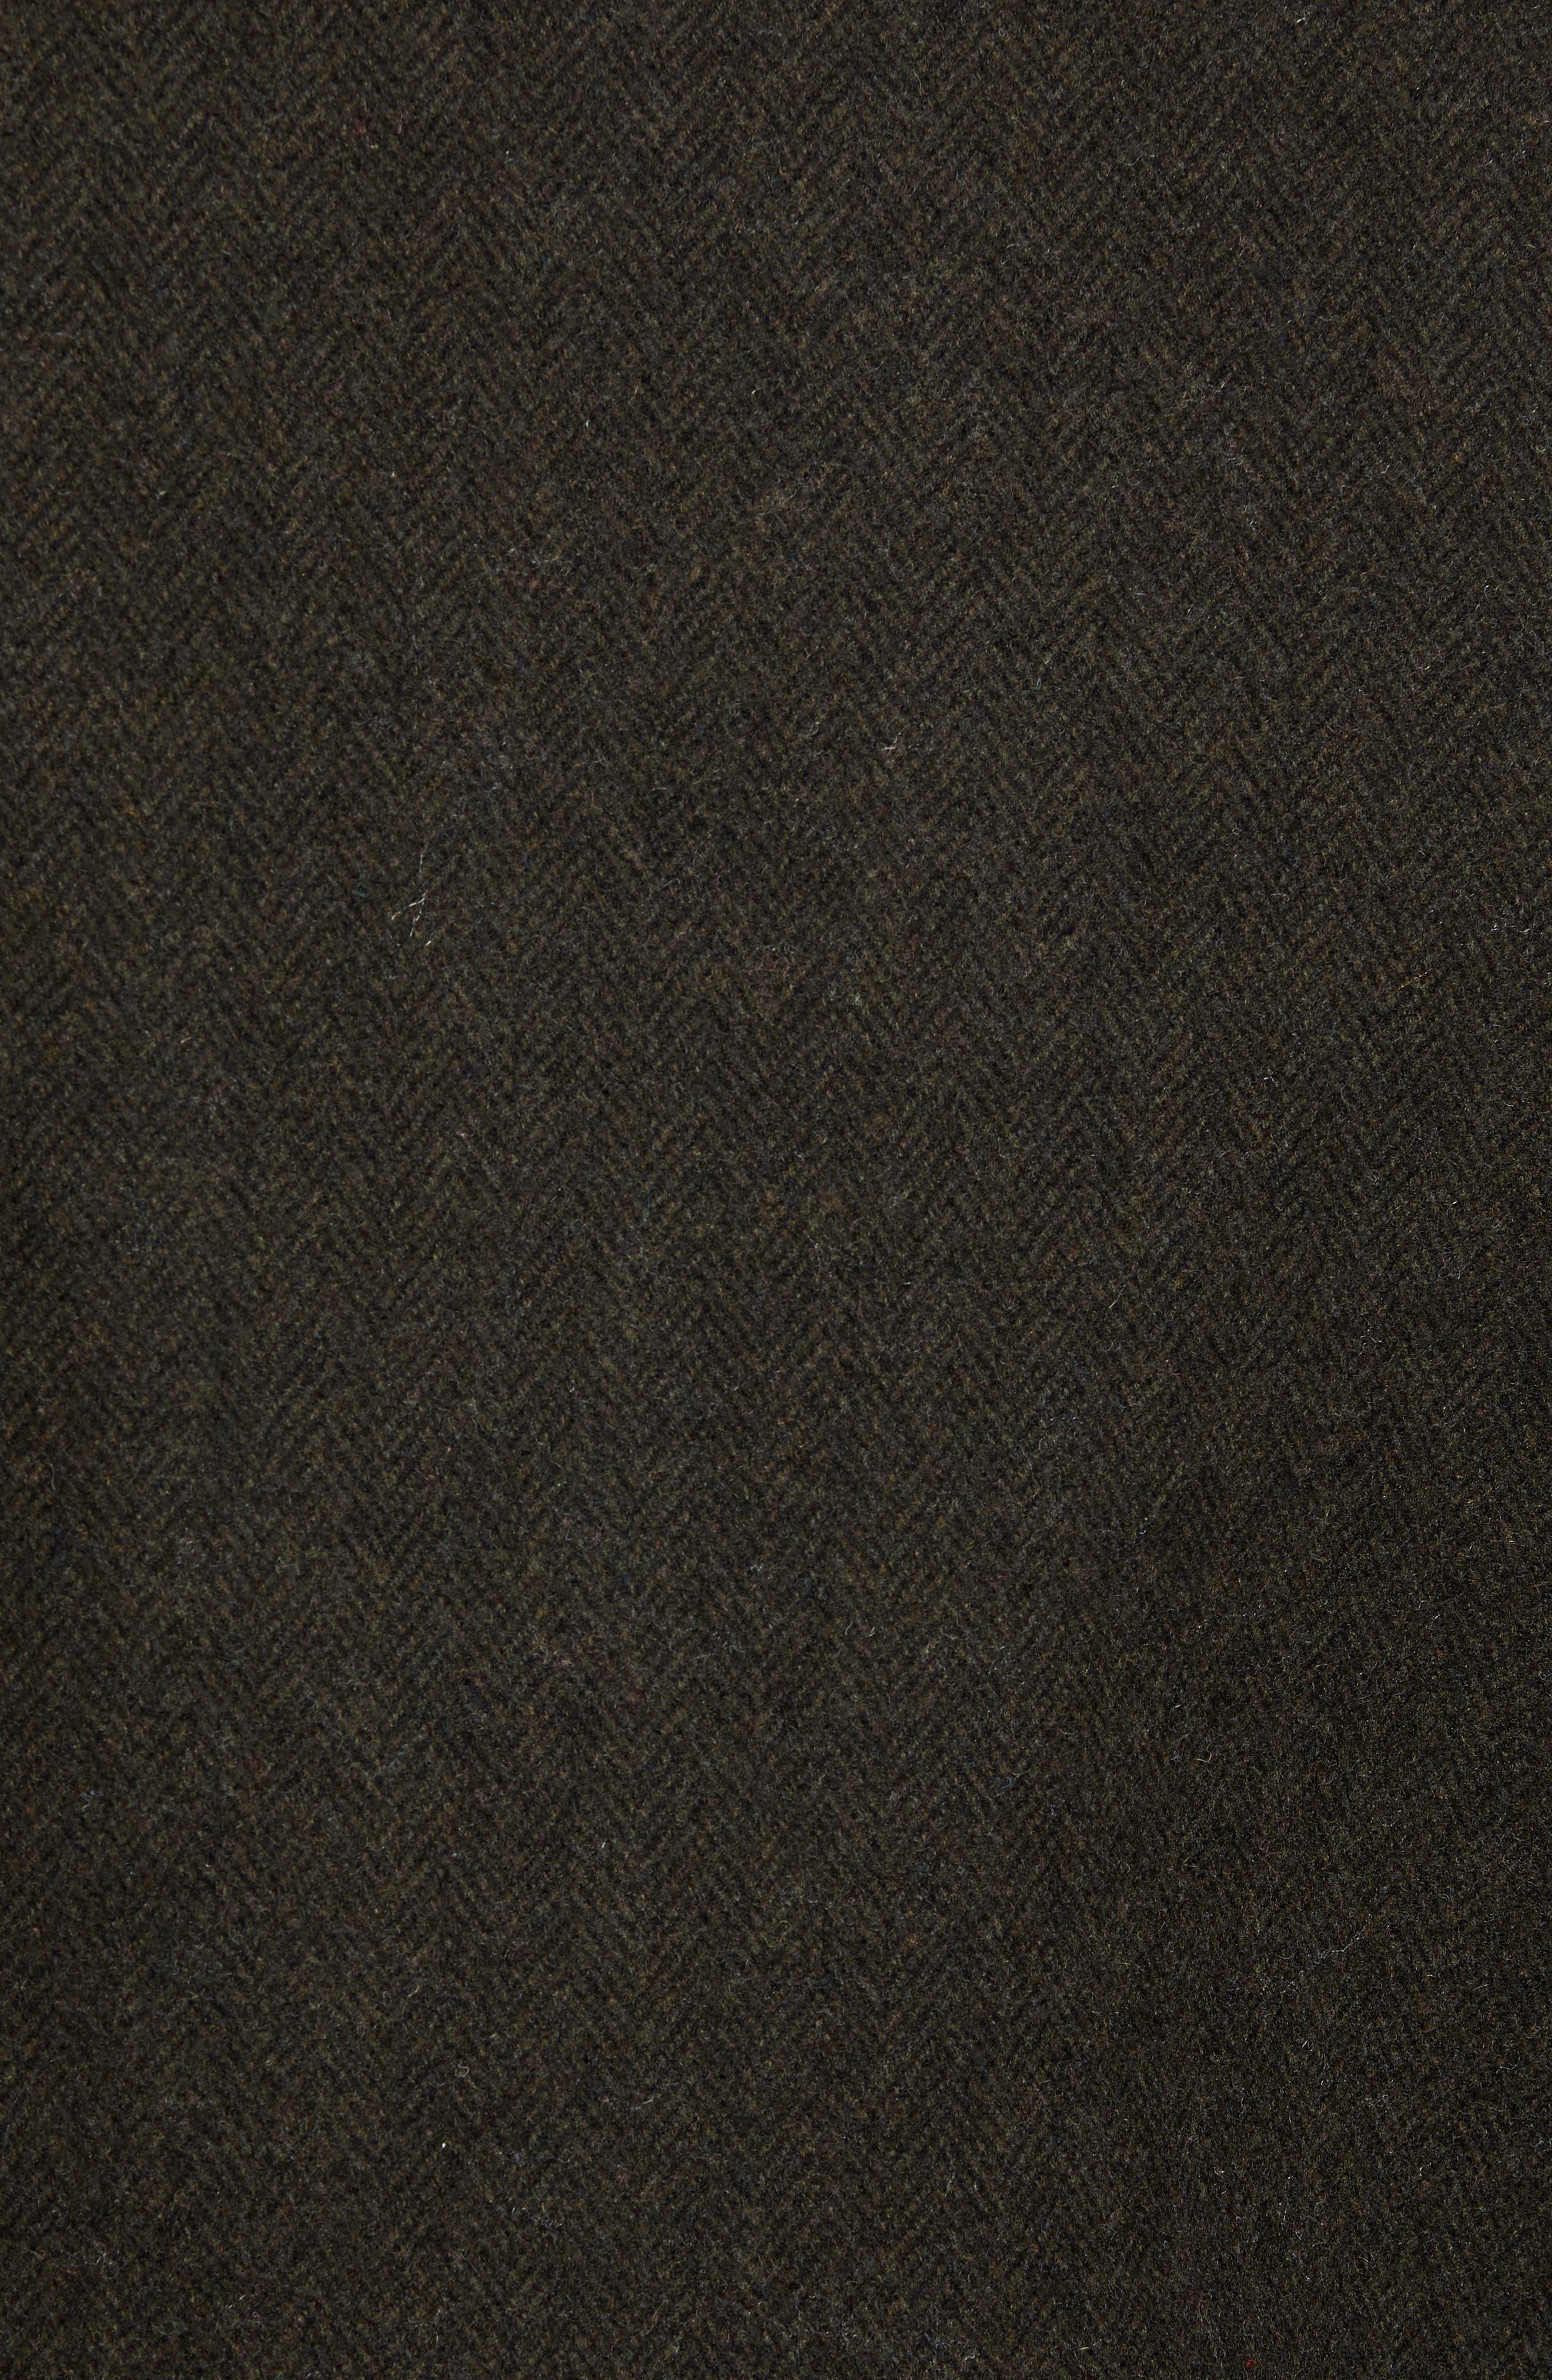 COLE HAAN SIGNATURE,                             Faux Shearling Trim Field Jacket,                             Alternate thumbnail 7, color,                             317